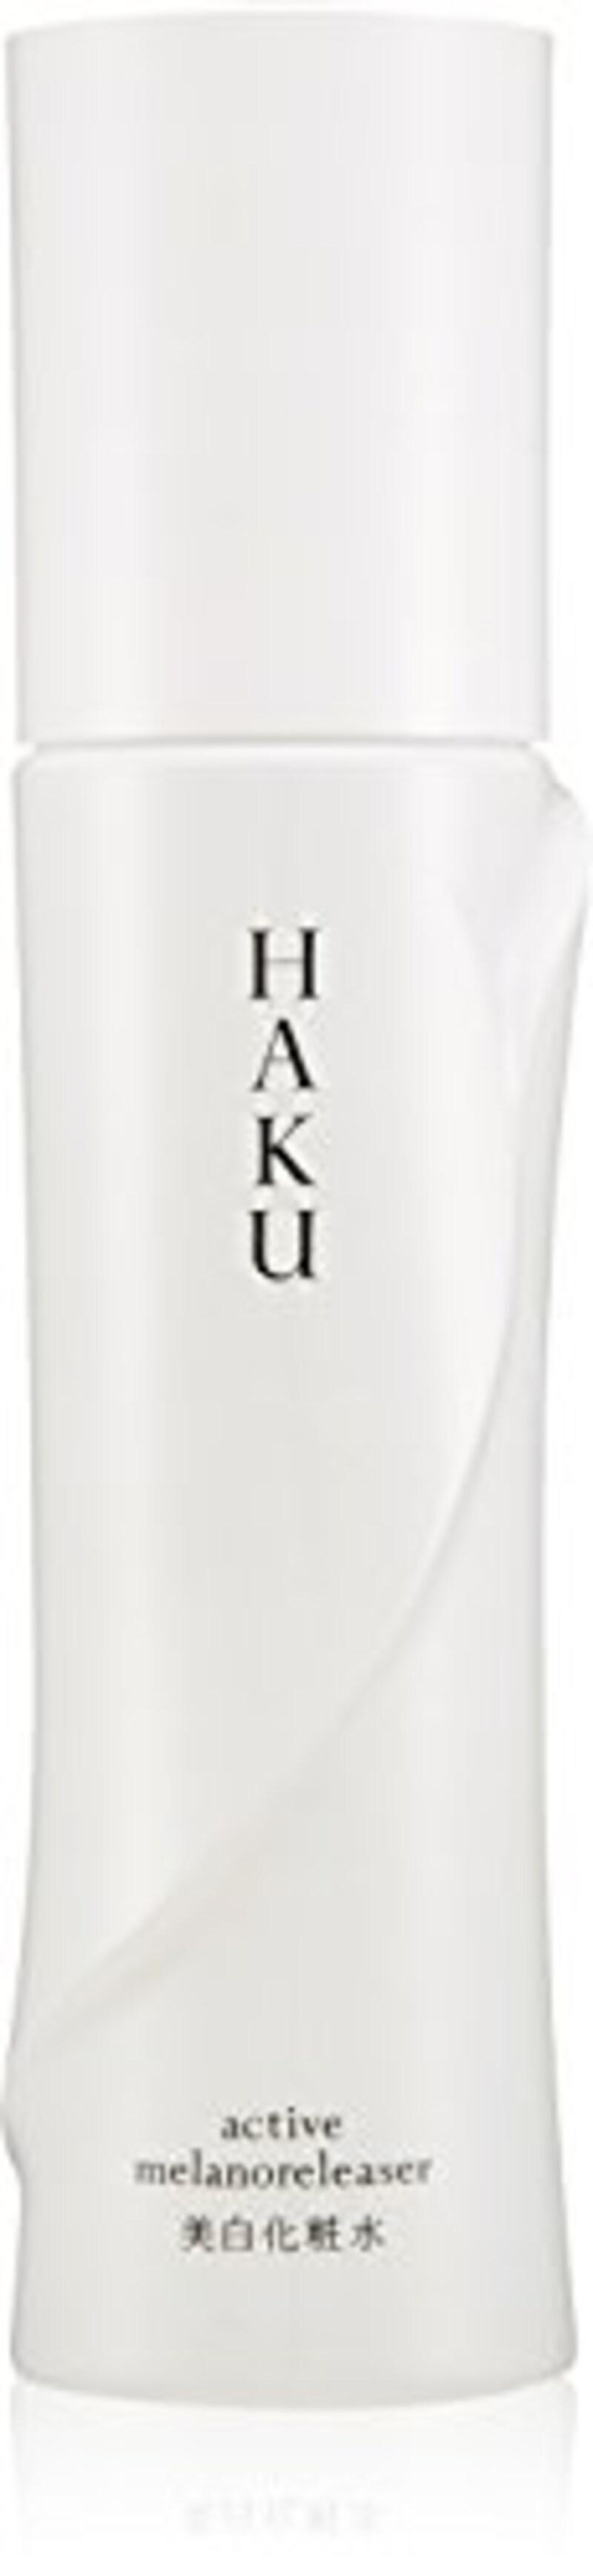 HAKU(ハク),アクティブメラノリリーサー